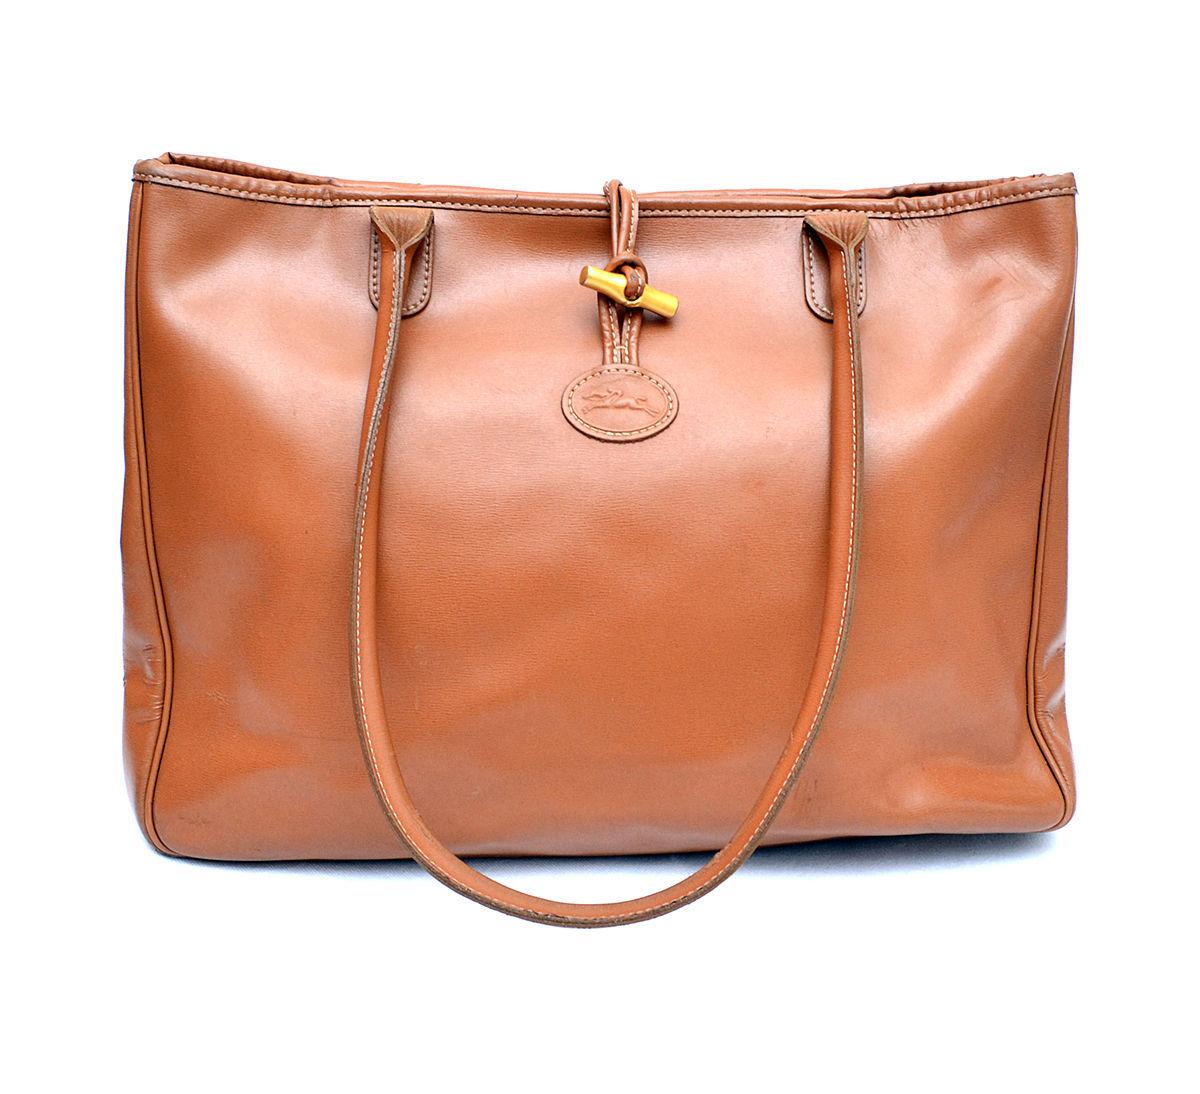 Auth Longchamp Roseau Leather Tote Shopper And 29 Similar Items Quadry Bag